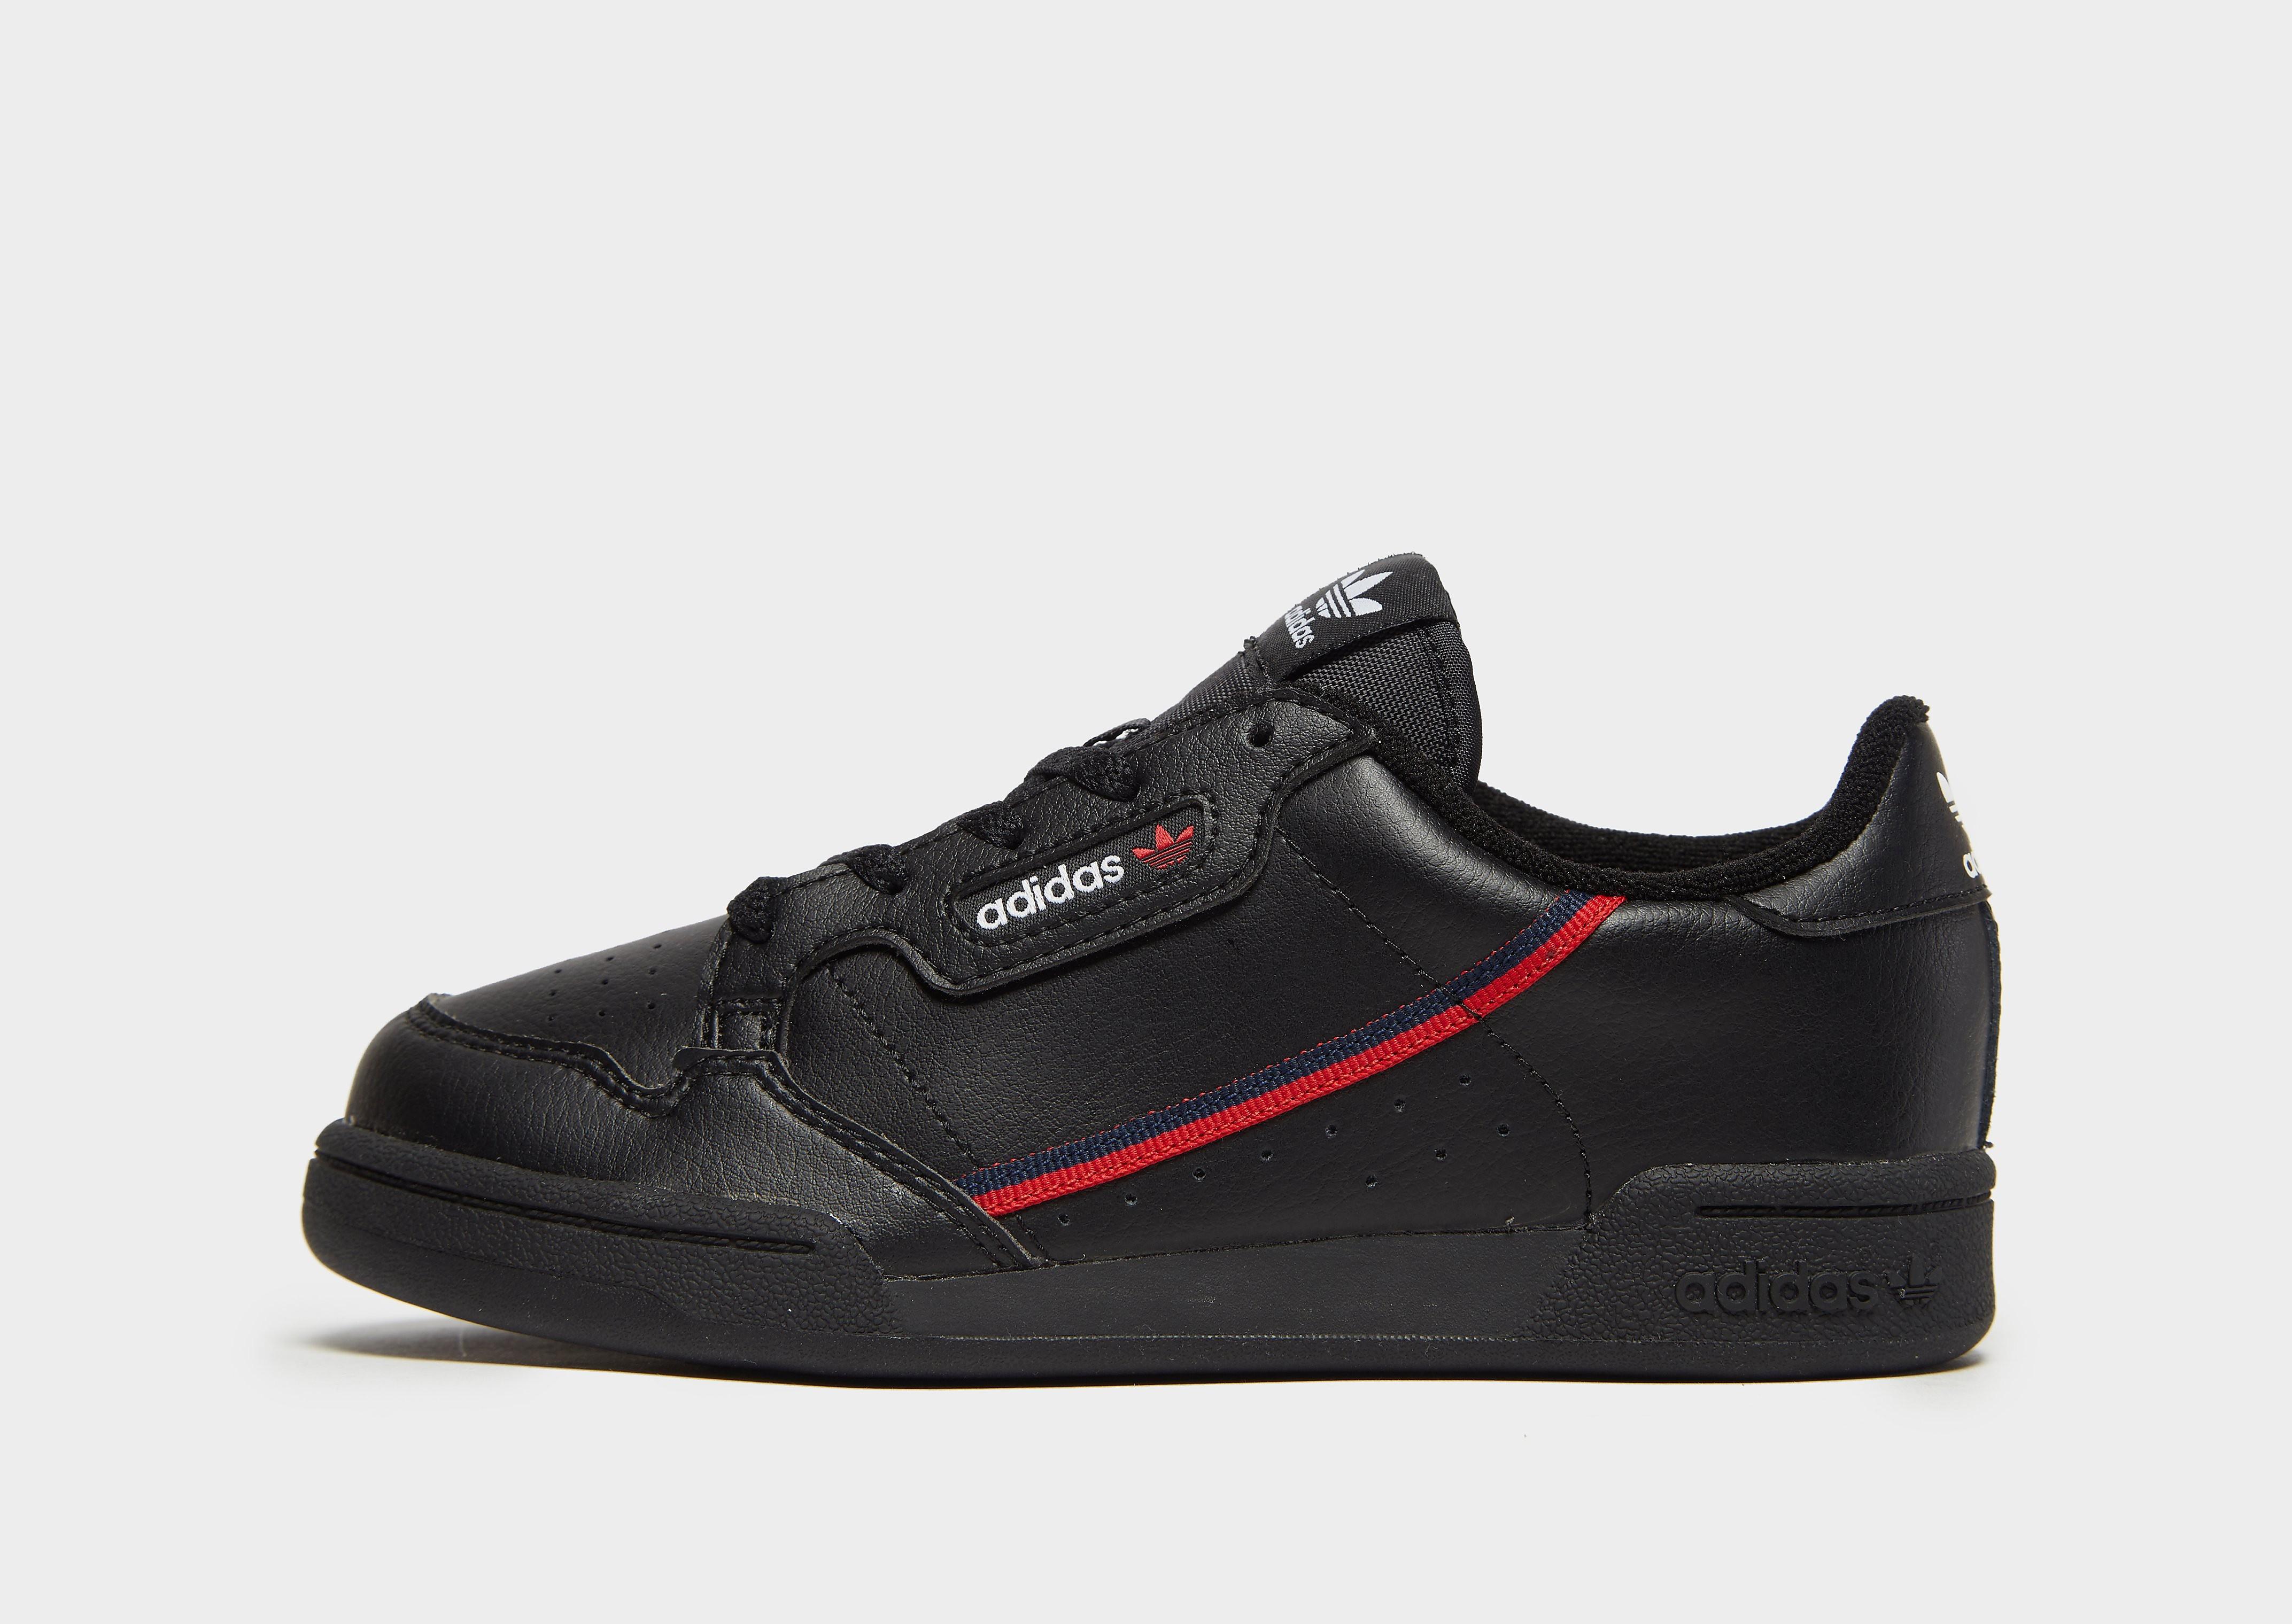 Adidas Continental 80 kindersneaker zwart, blauw en rood